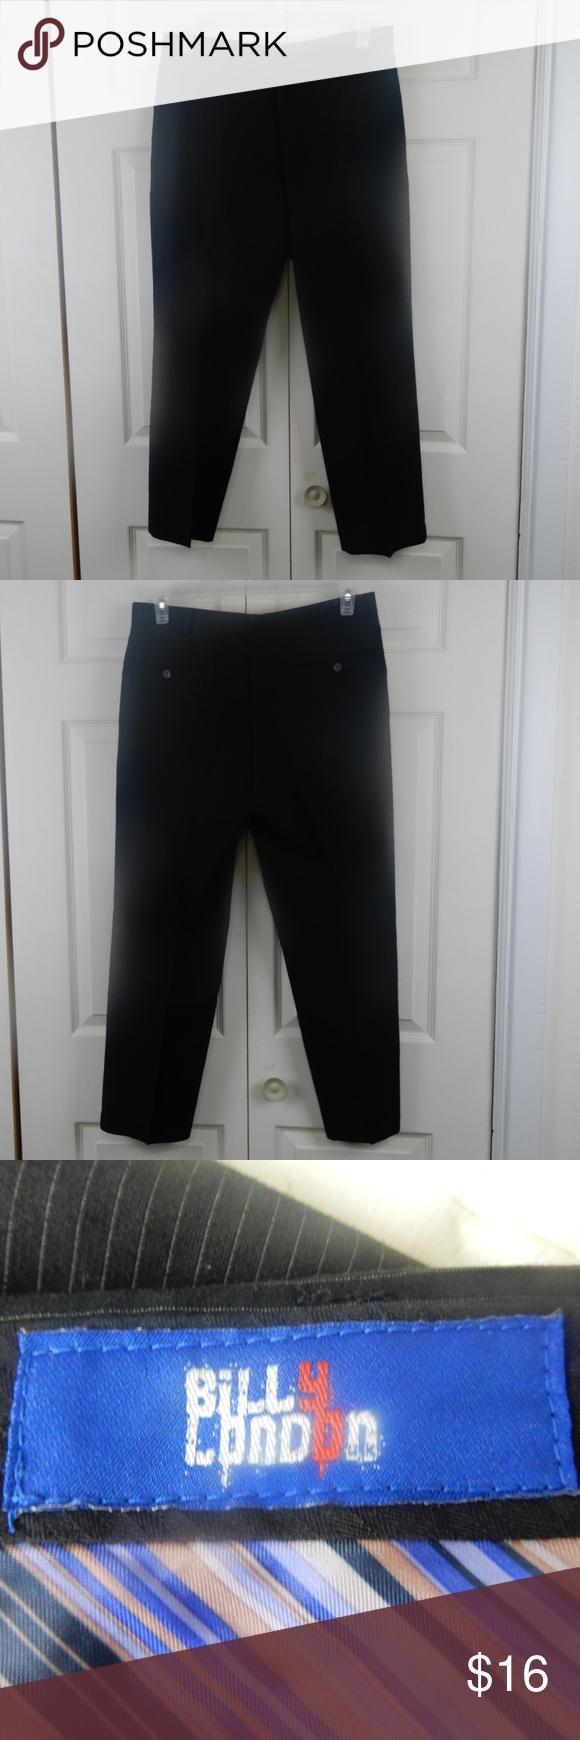 93d4567f Mens Black Dress Pants 30 X 34 - raveitsafe